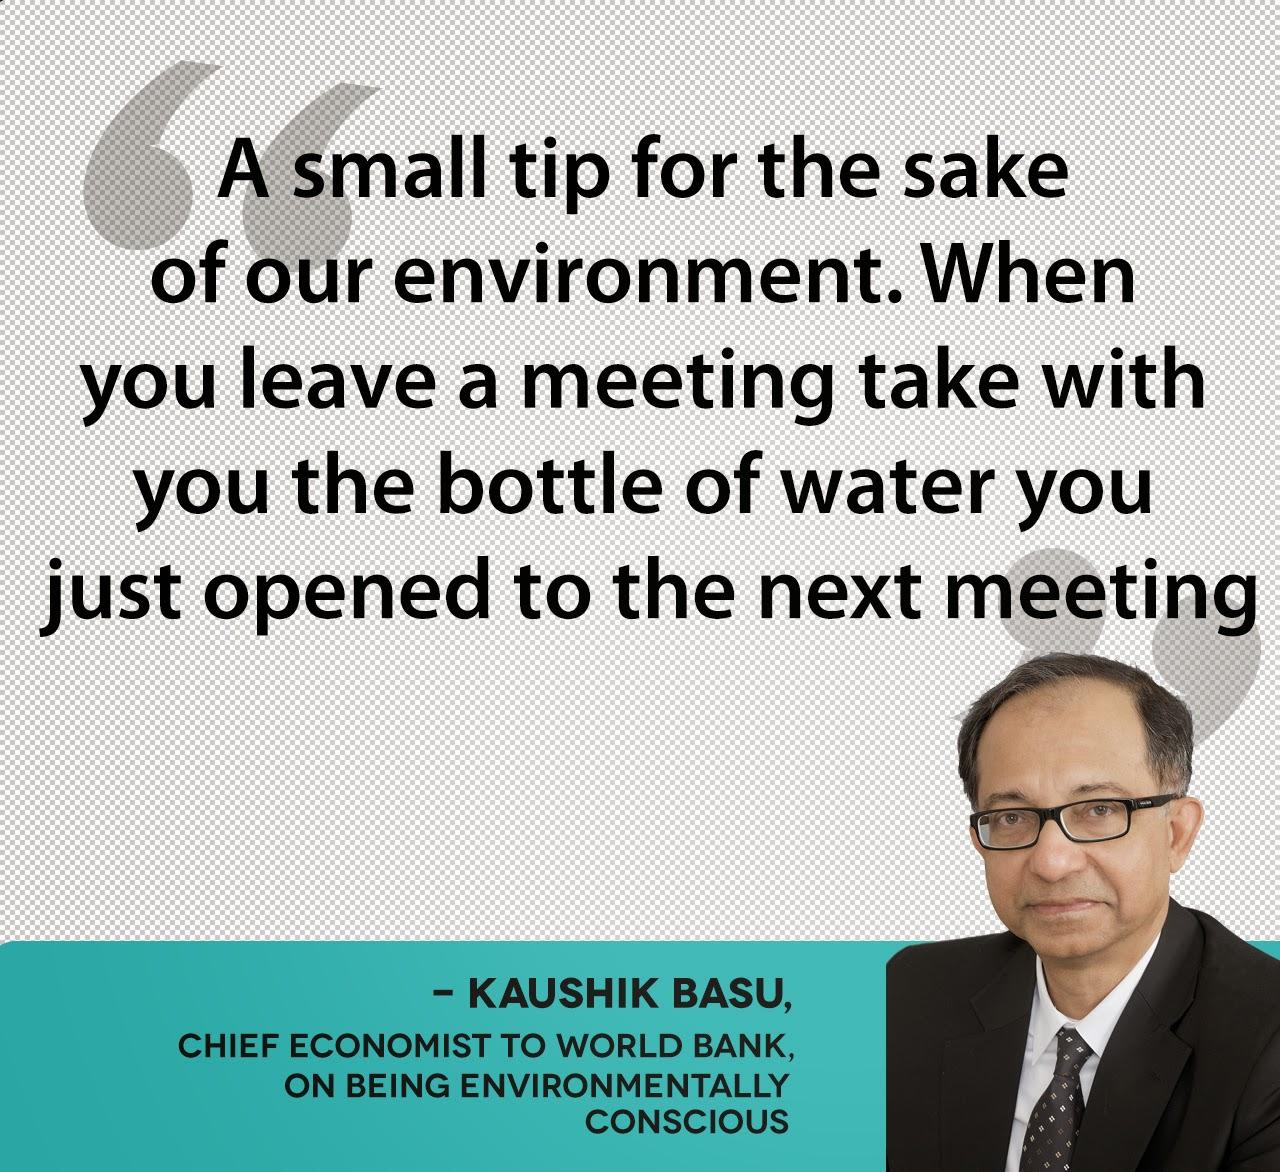 - KAUSHIK BASU, chief economist to World Bank,  on being environmentally  conscious